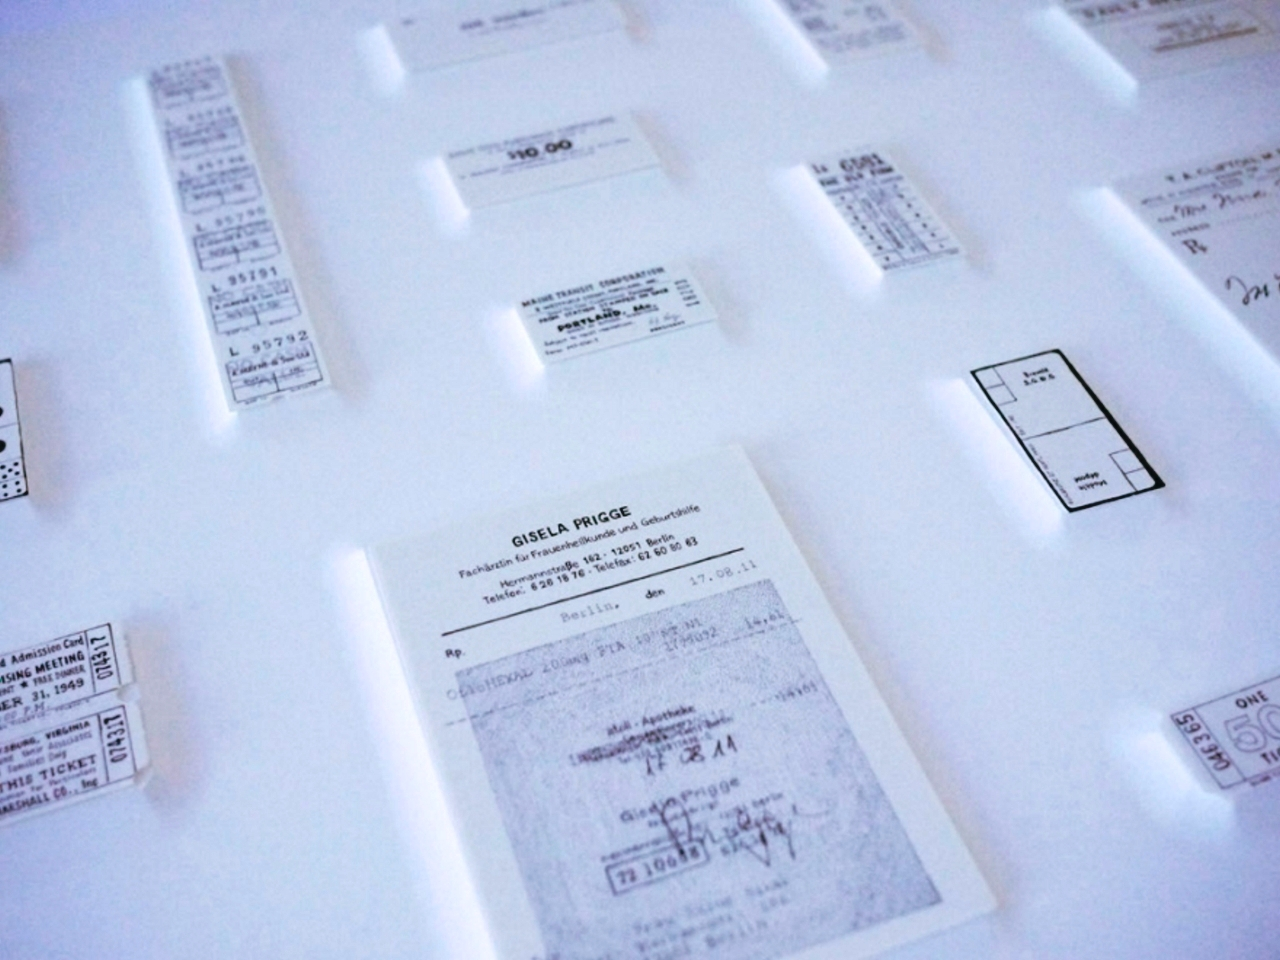 jinah ham receipts triennale salone milan 2016 (1)